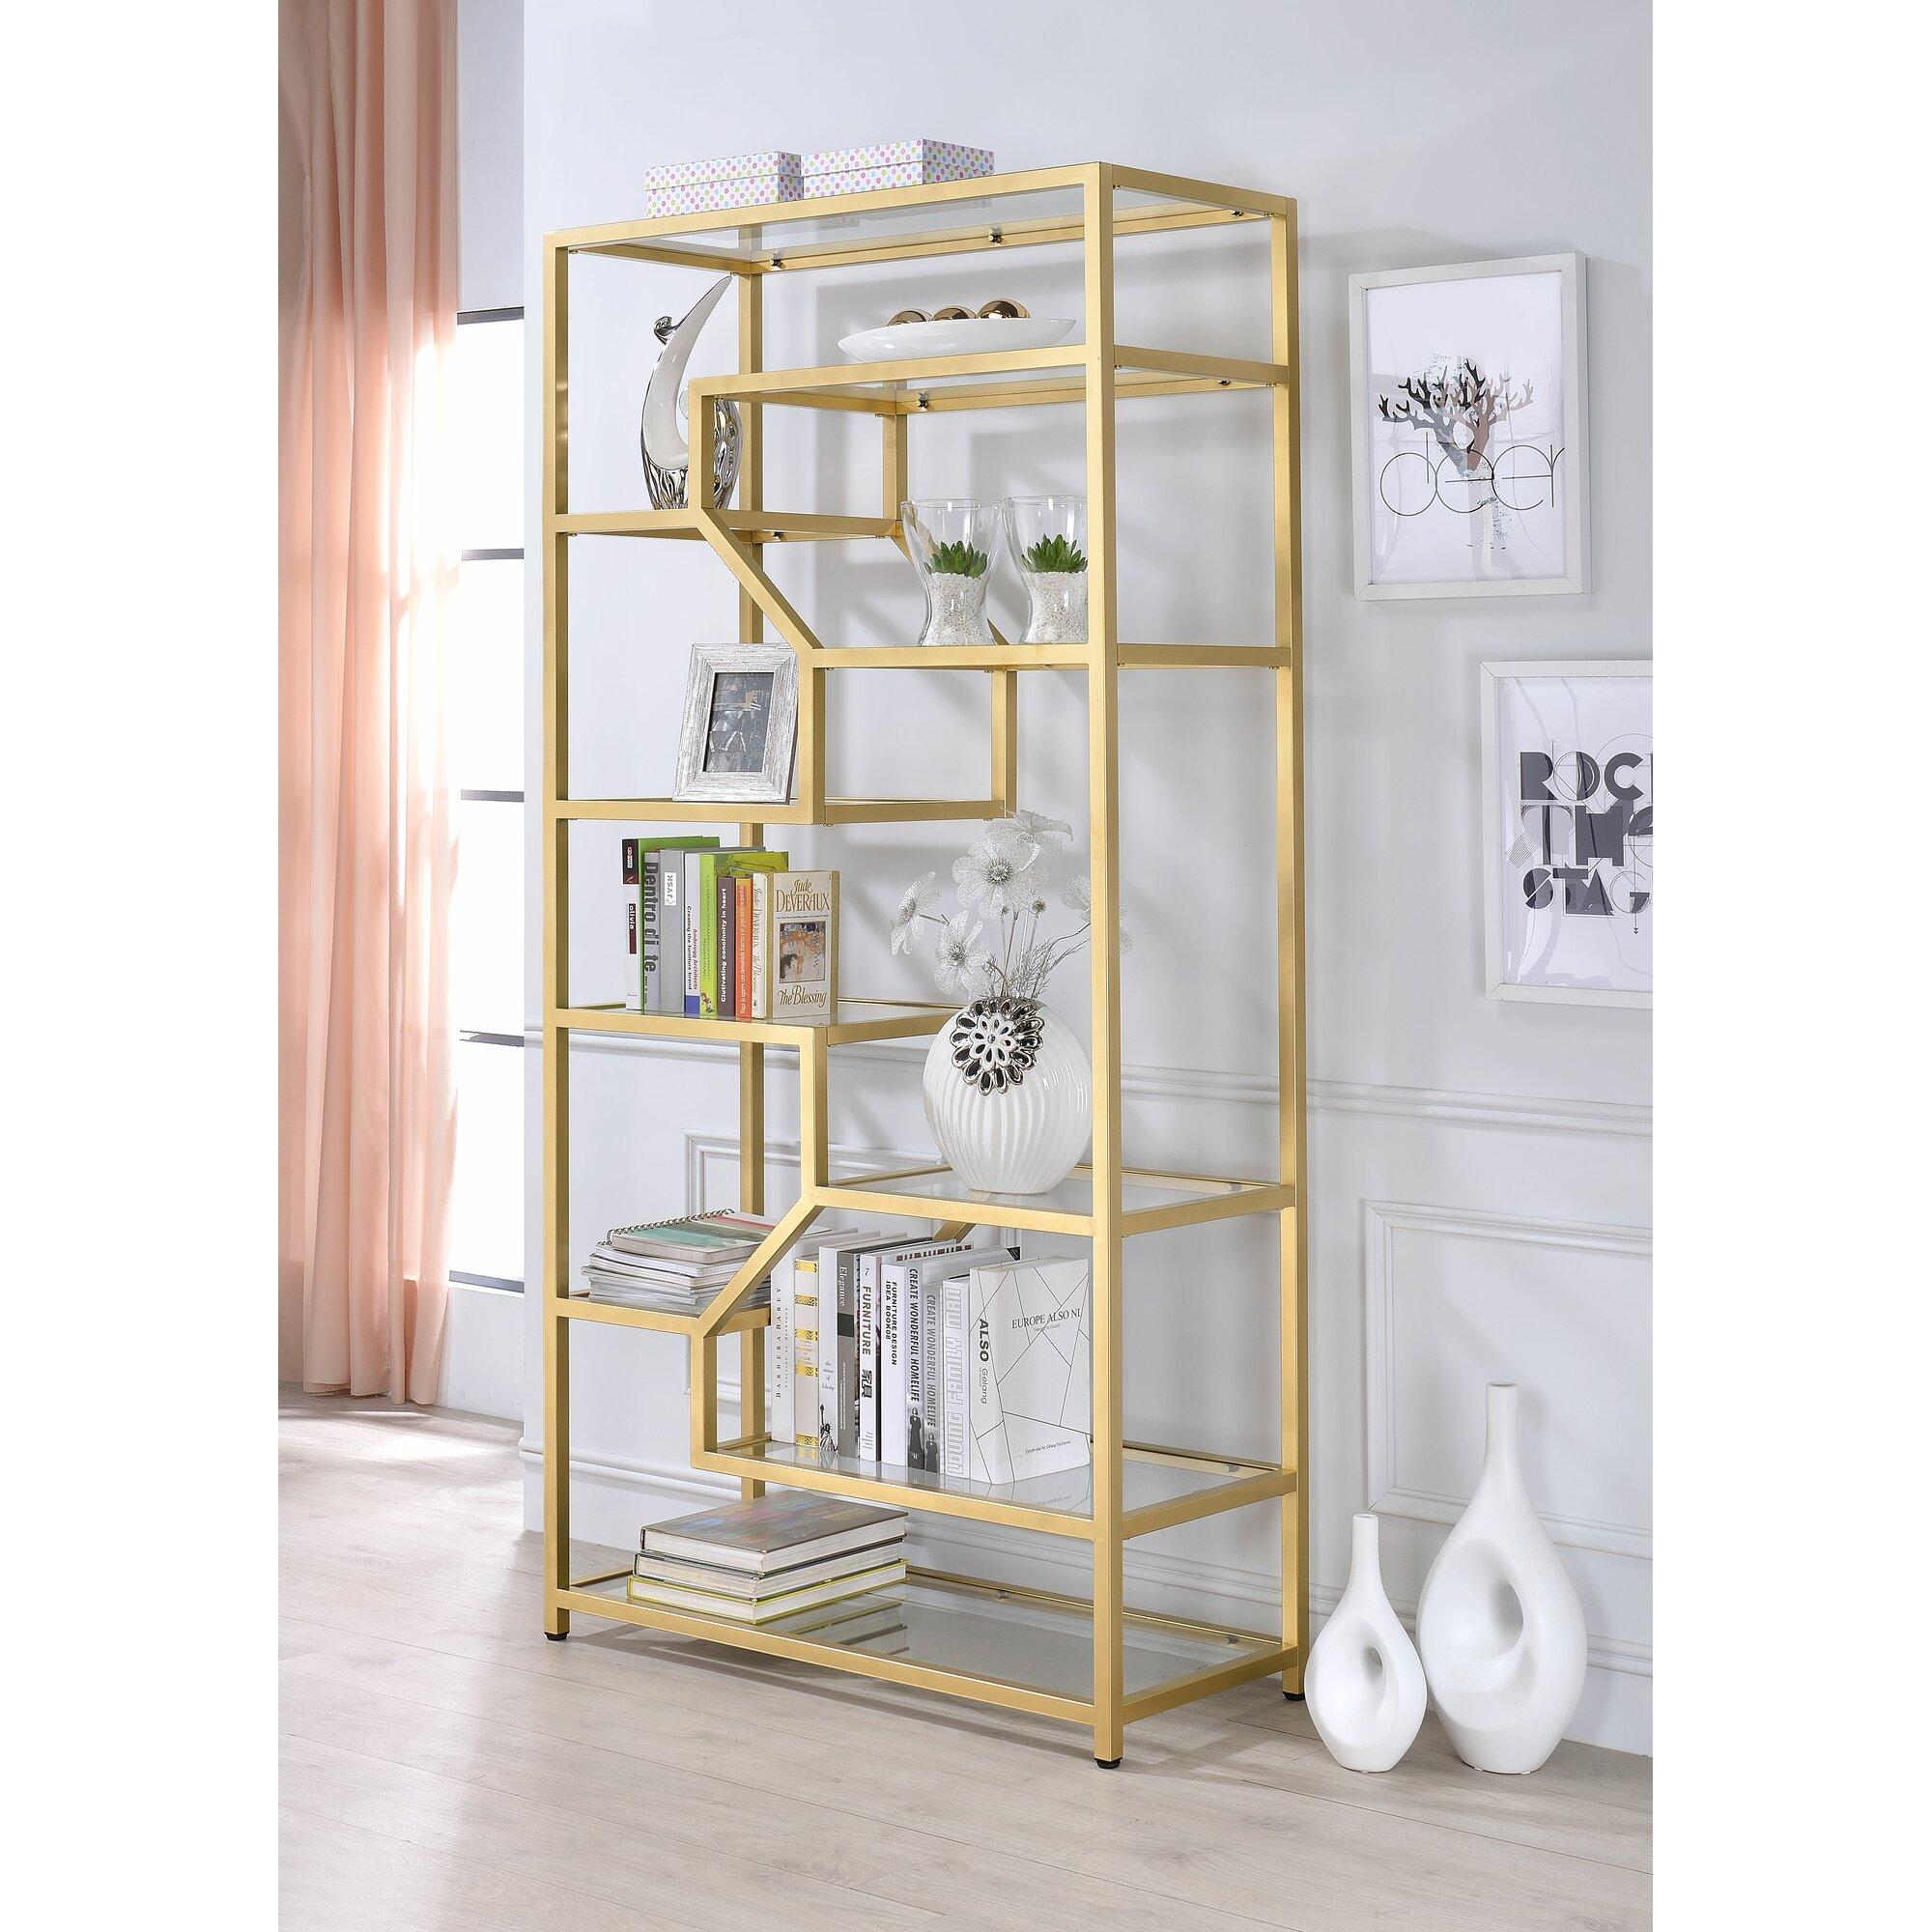 Alida cube 77 etagere bookcase joss main - Etagere cube modulable ...